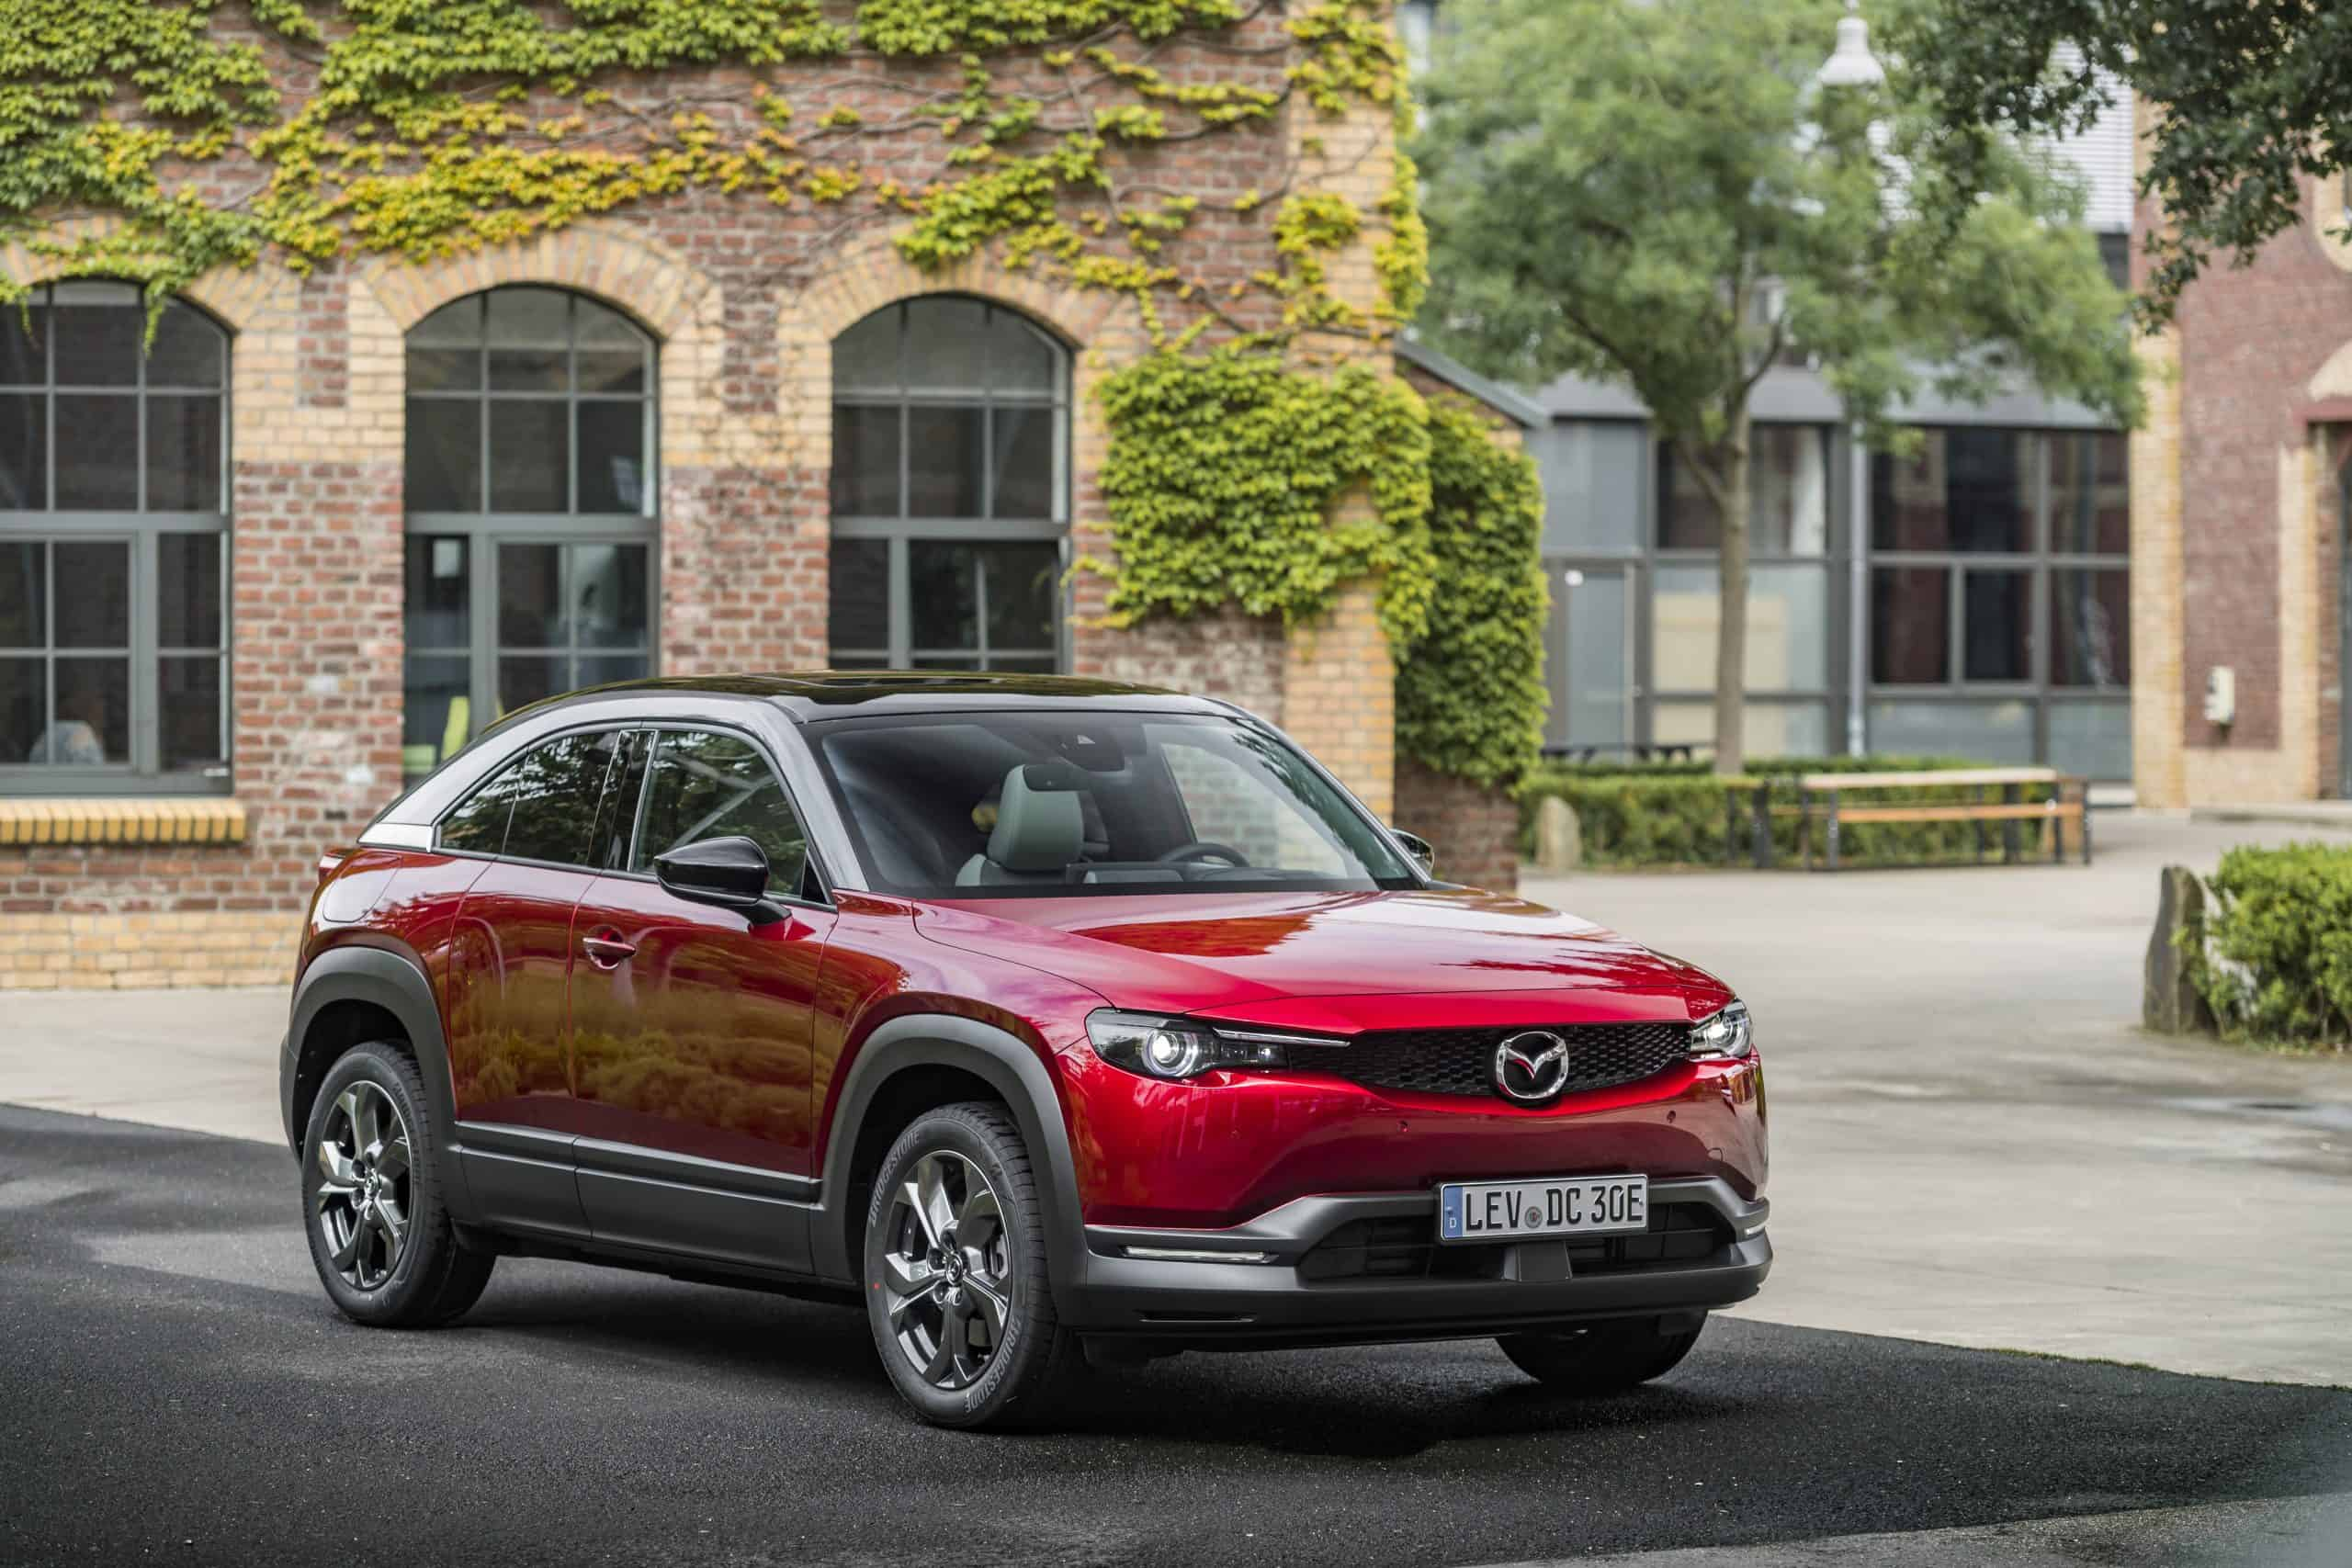 14-Static---Mazda-MX-30-Soul-Red-Crystal-Modern-Confidence